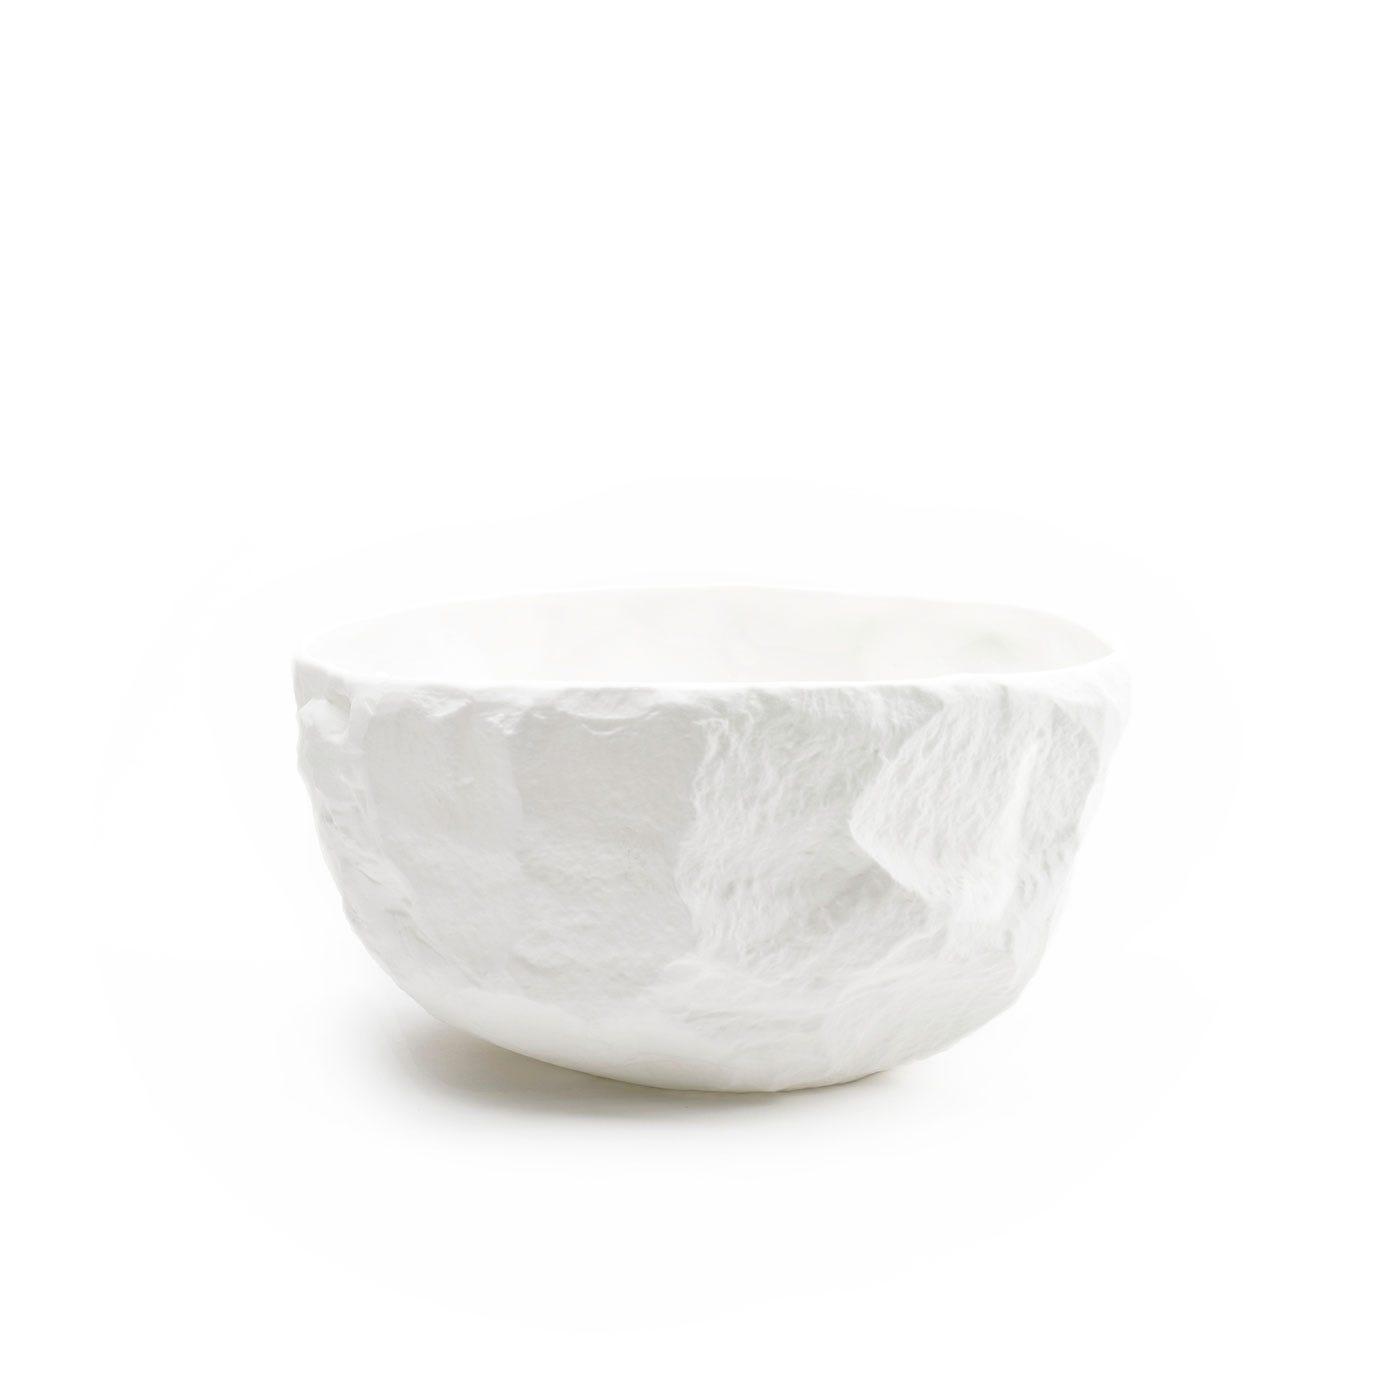 Crockery Deep Bowl Large White